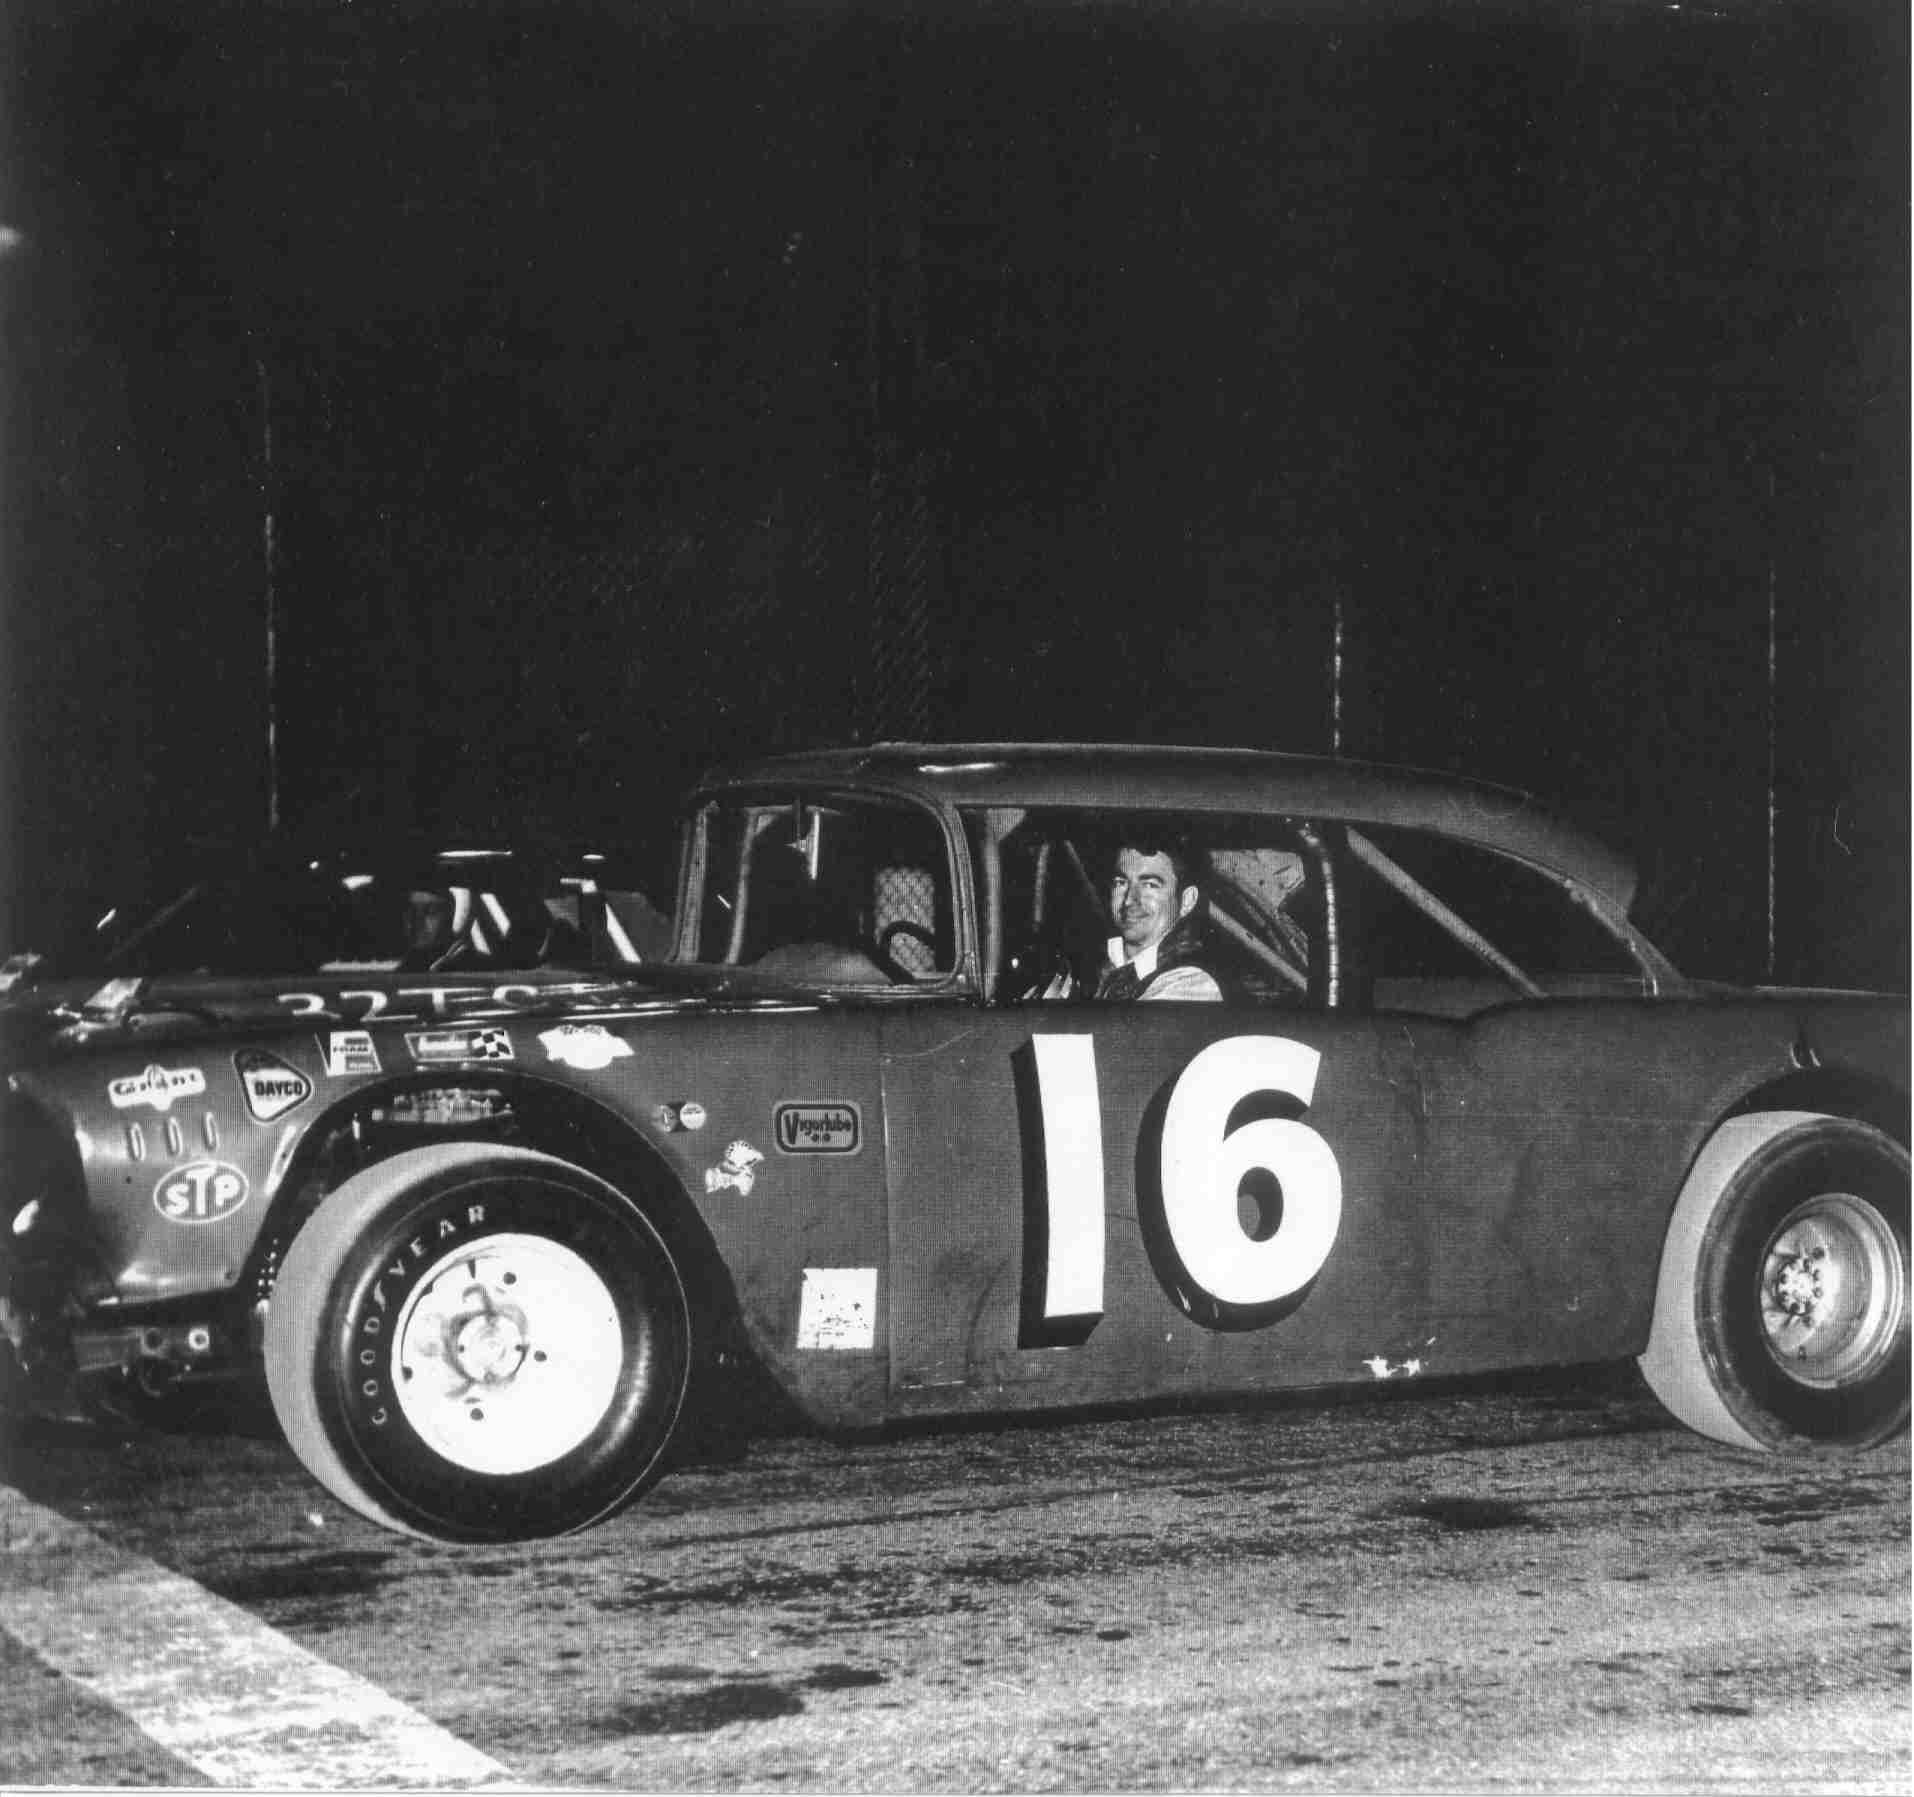 nascar ruining stock car racing | Old School Racing Motorsports